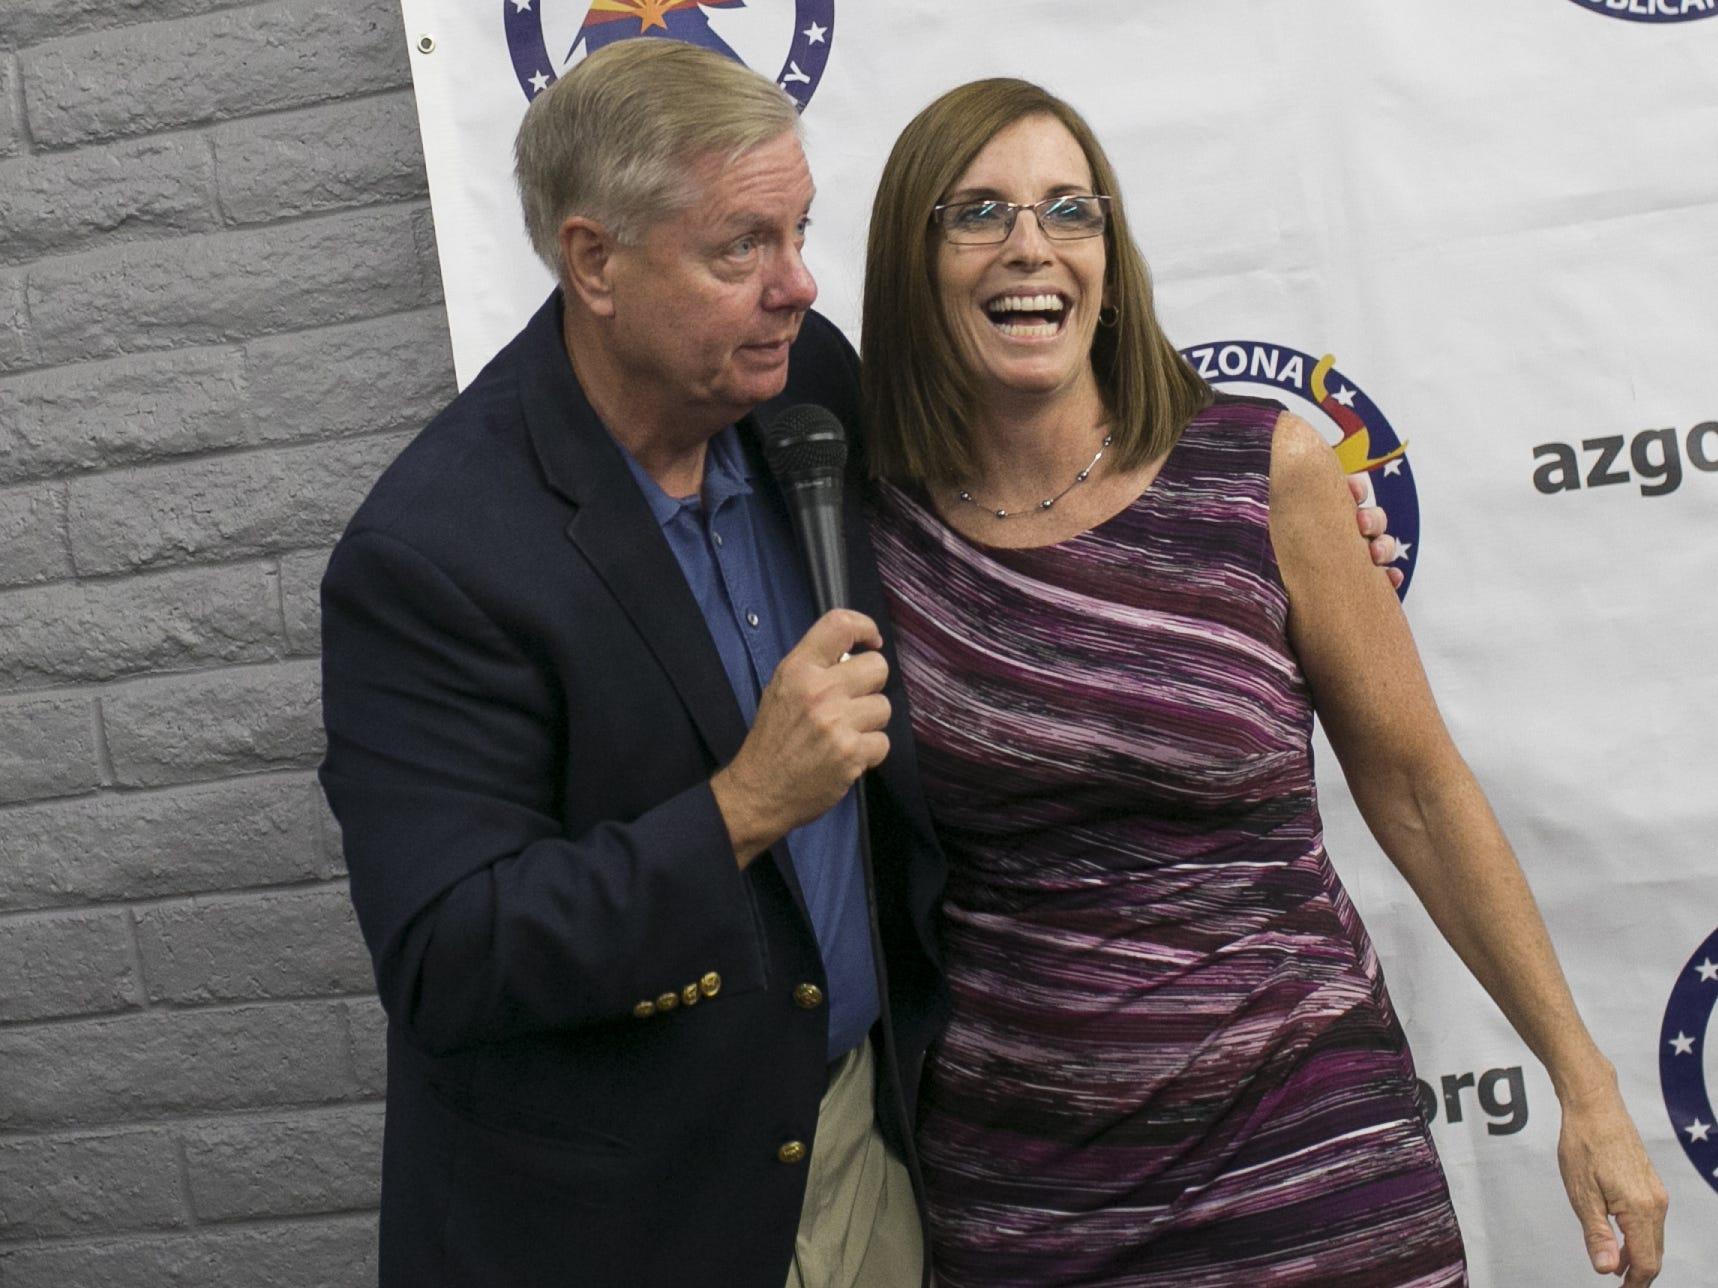 Sen. Lindsey Graham, R-S.C. (hugs U.S. Senate candidate Martha McSally at the Arizona GOP headquarters in Phoenix, Ariz. on Oct. 27, 2018.